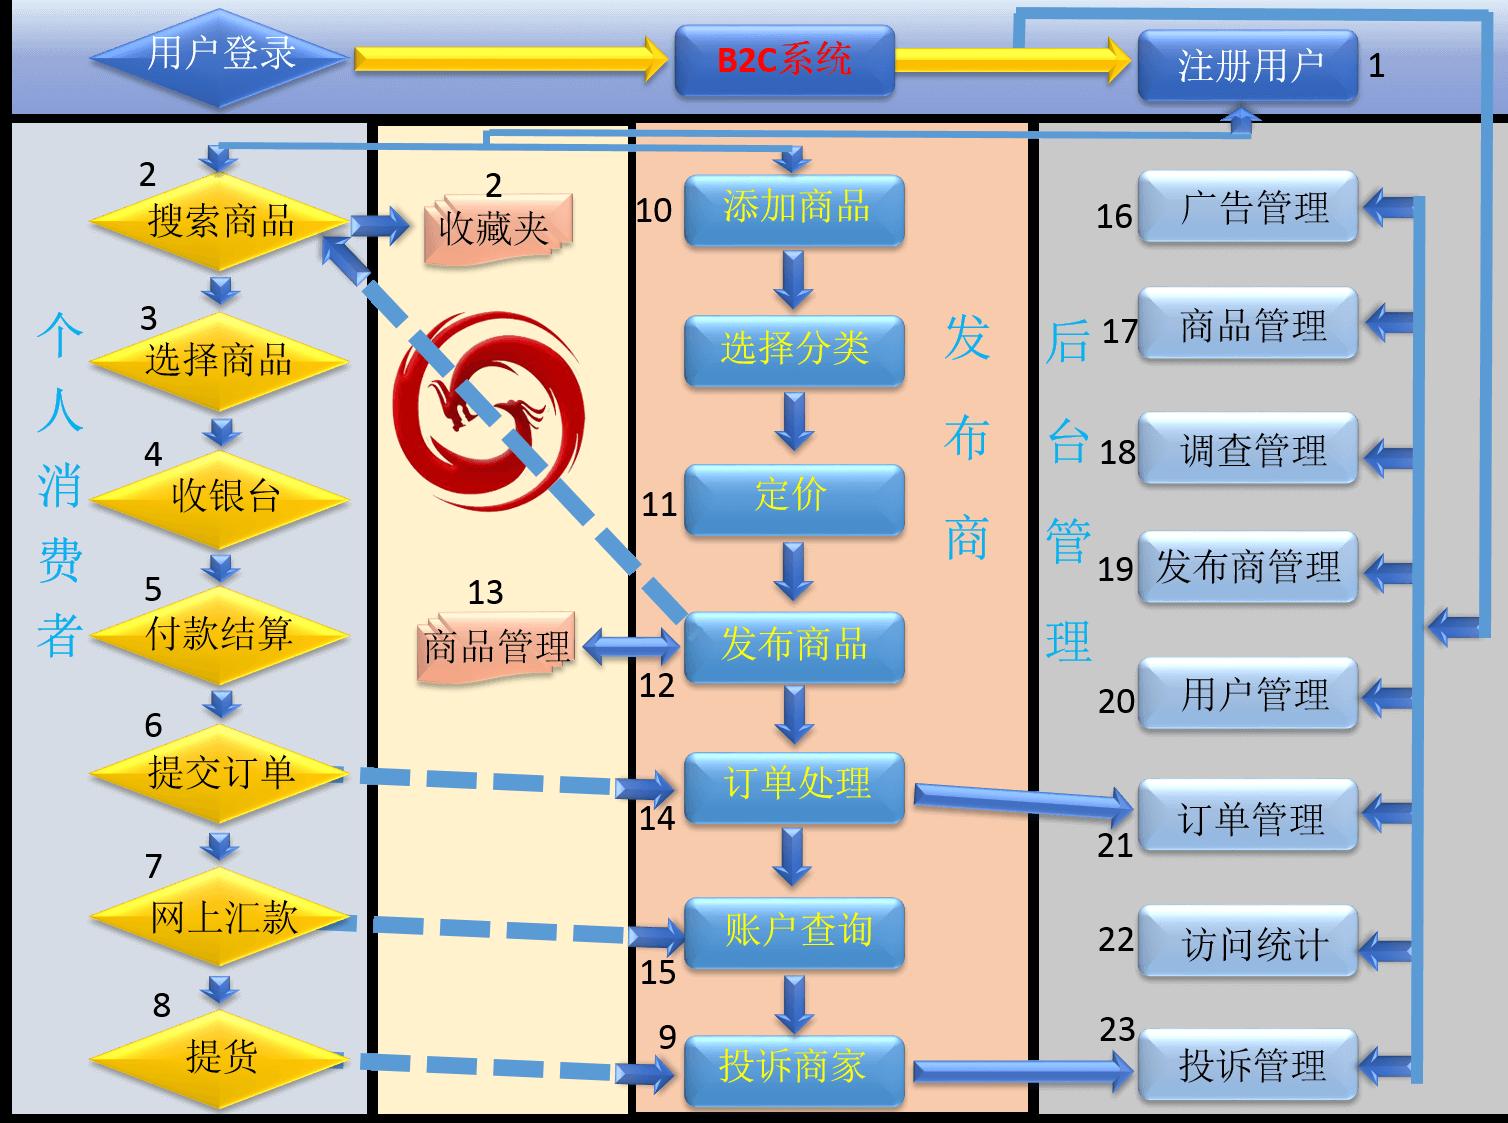 B2C系统流程图